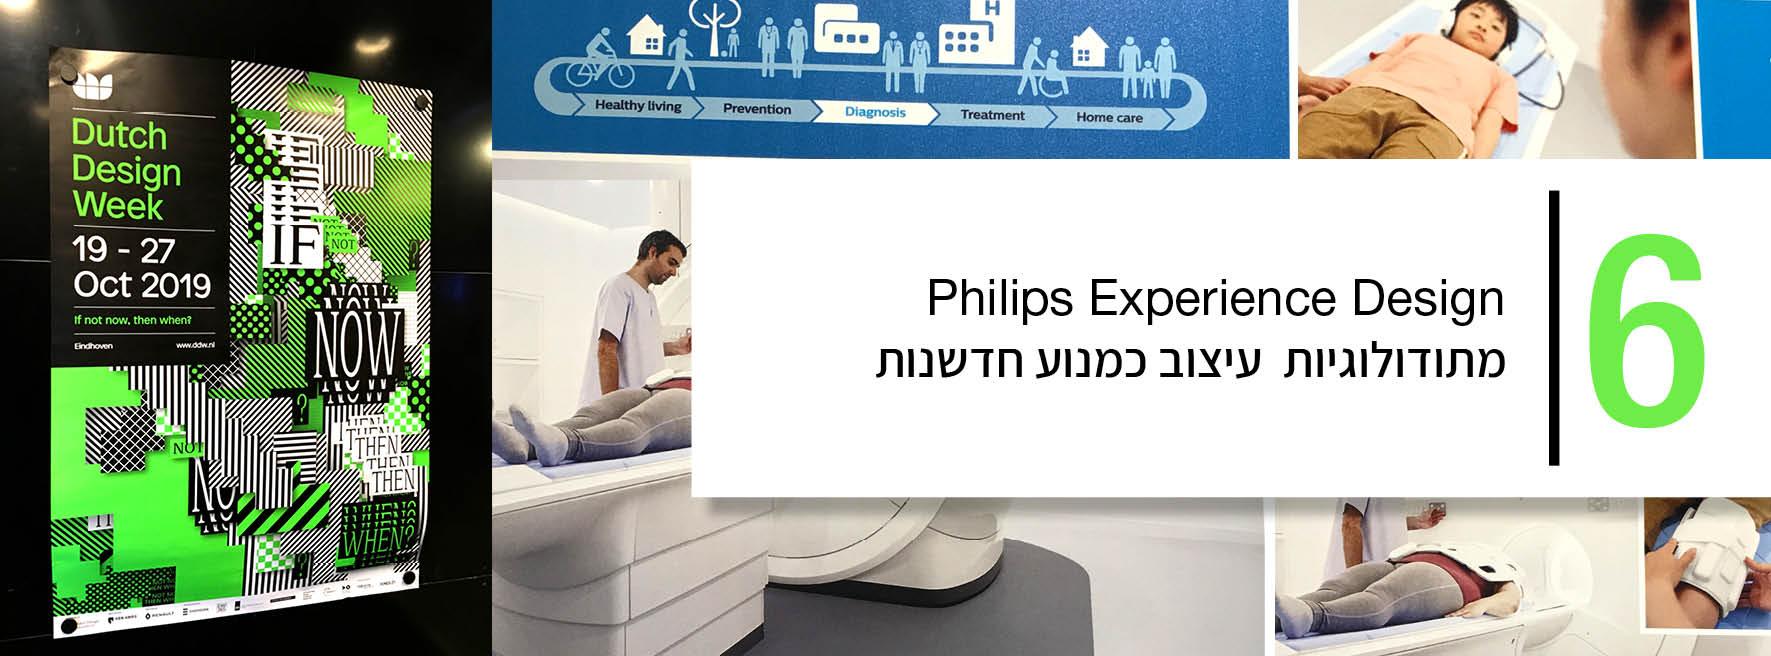 Philips Experience Design. מתודולוגיות עיצוב כמנוע חדשנות בפיליפס